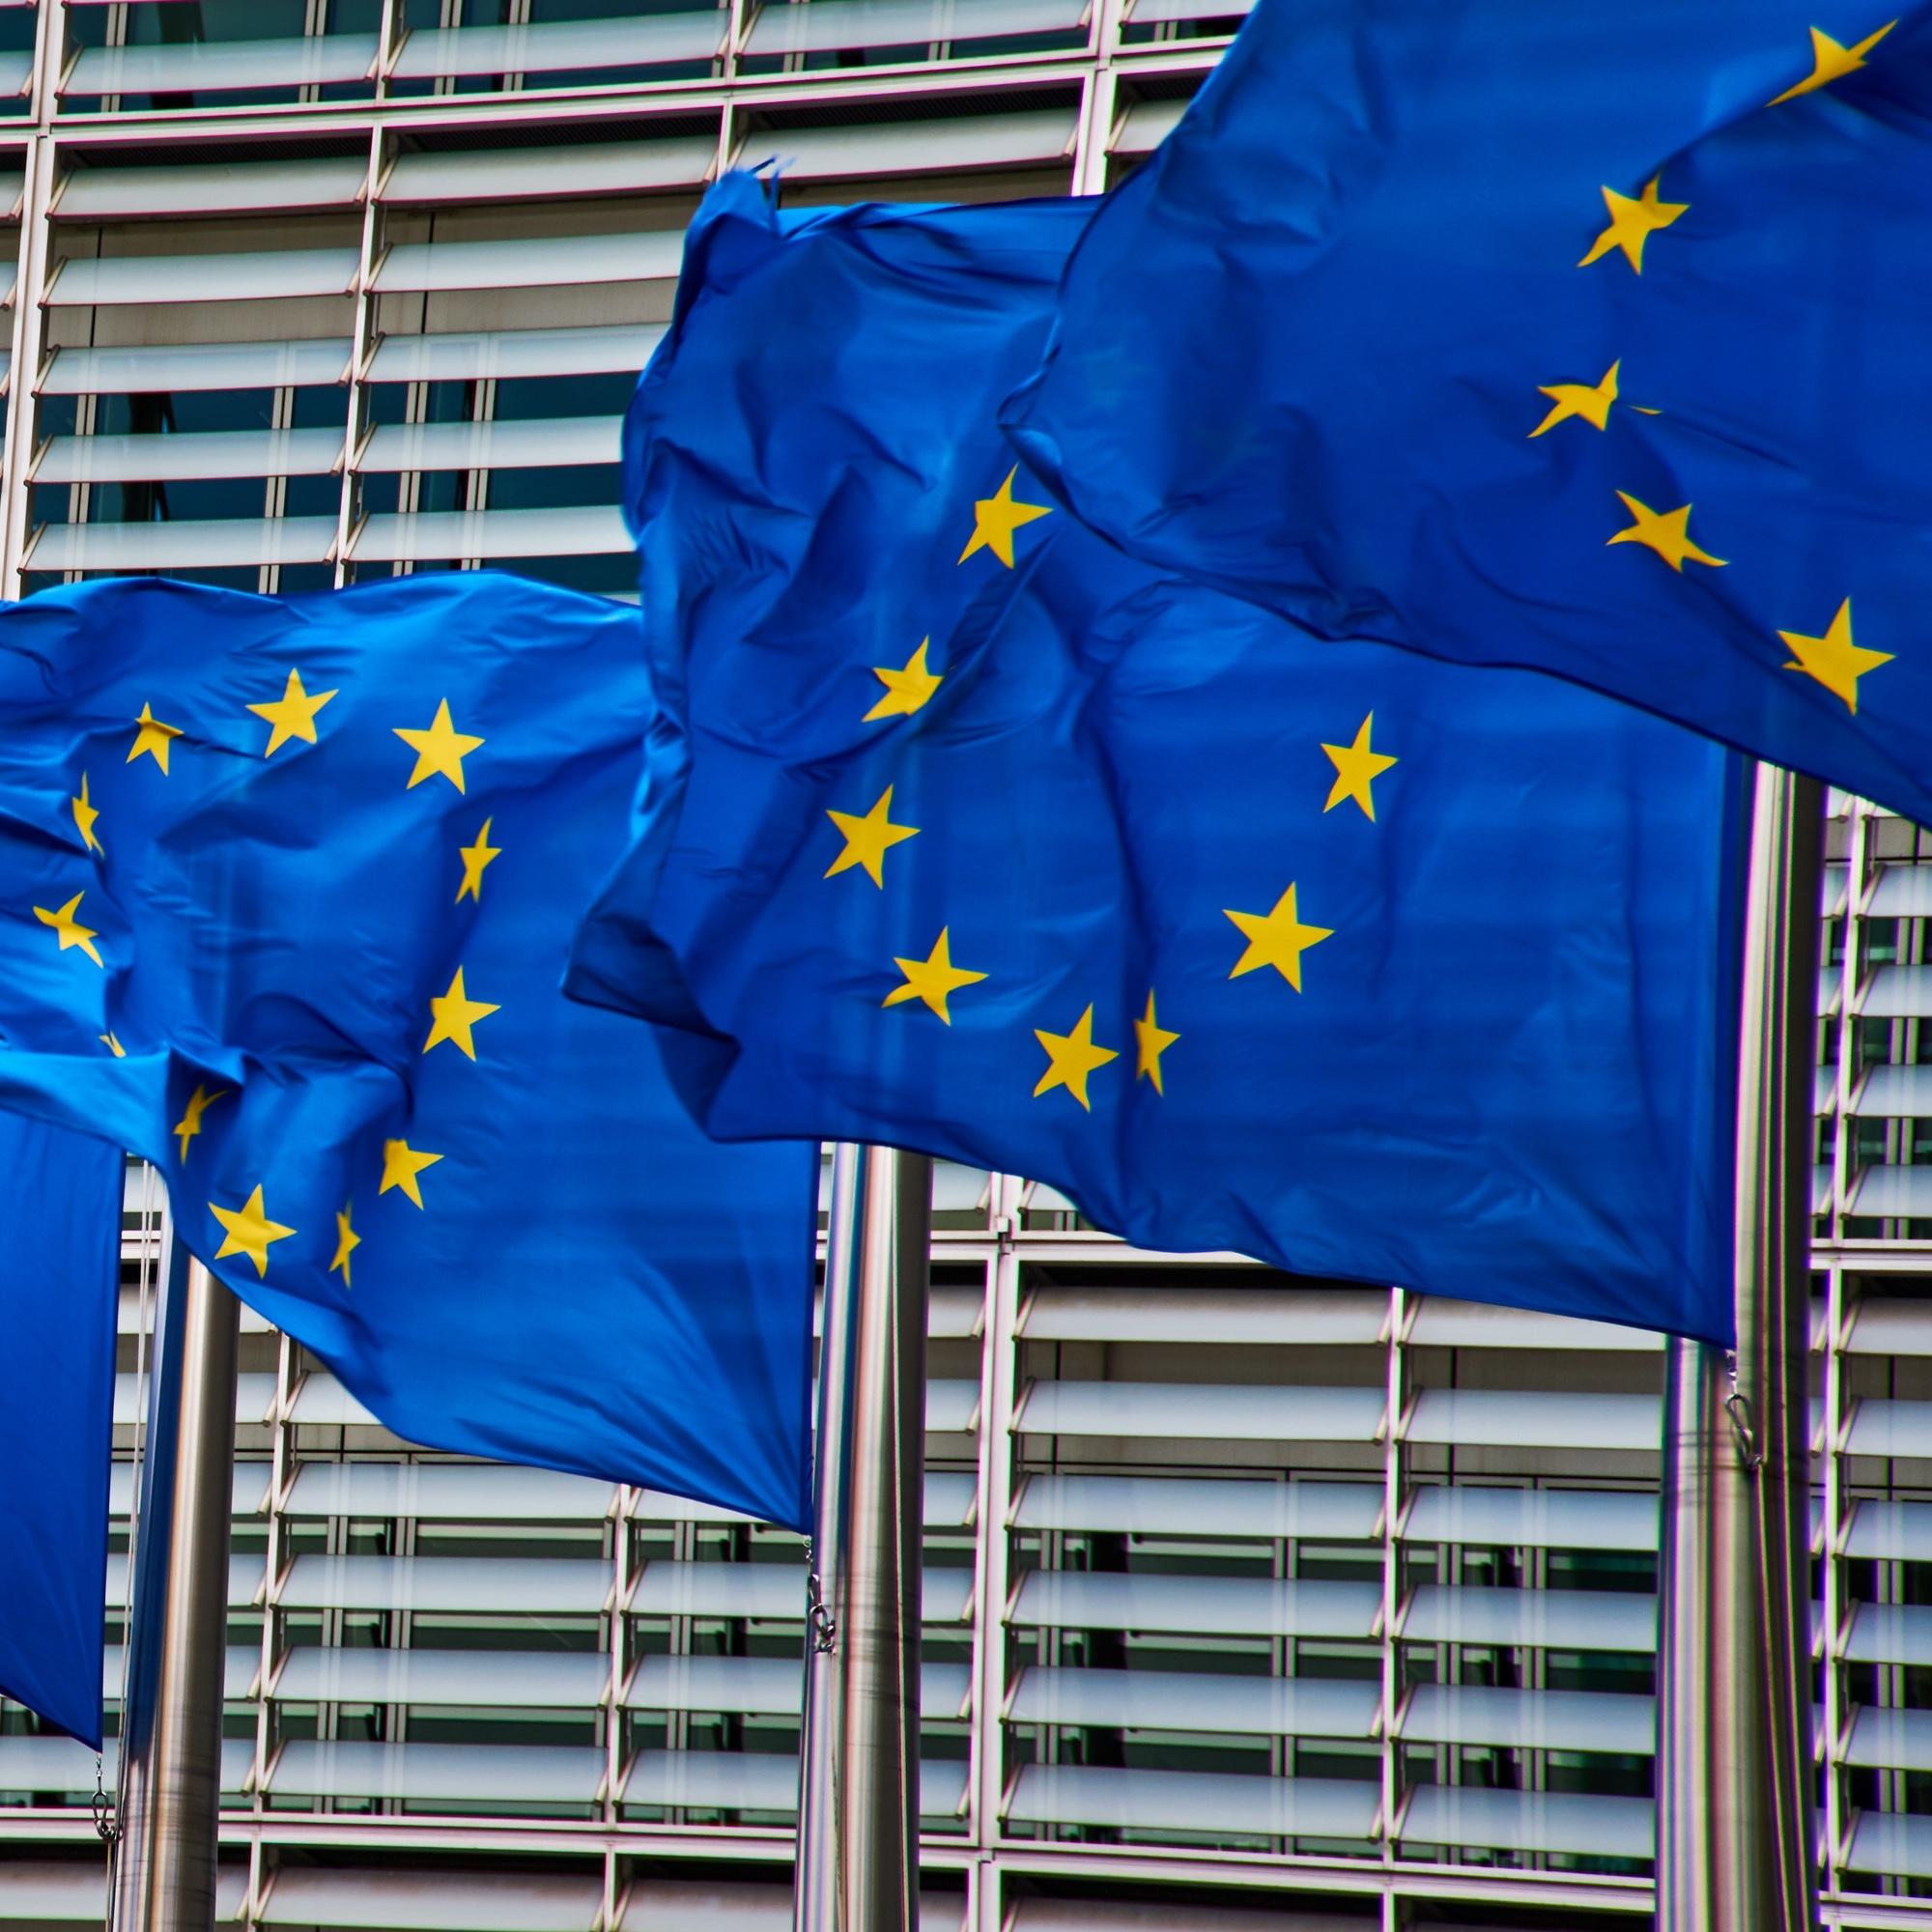 Foto: Flaggen der Europäischen Union (EU)